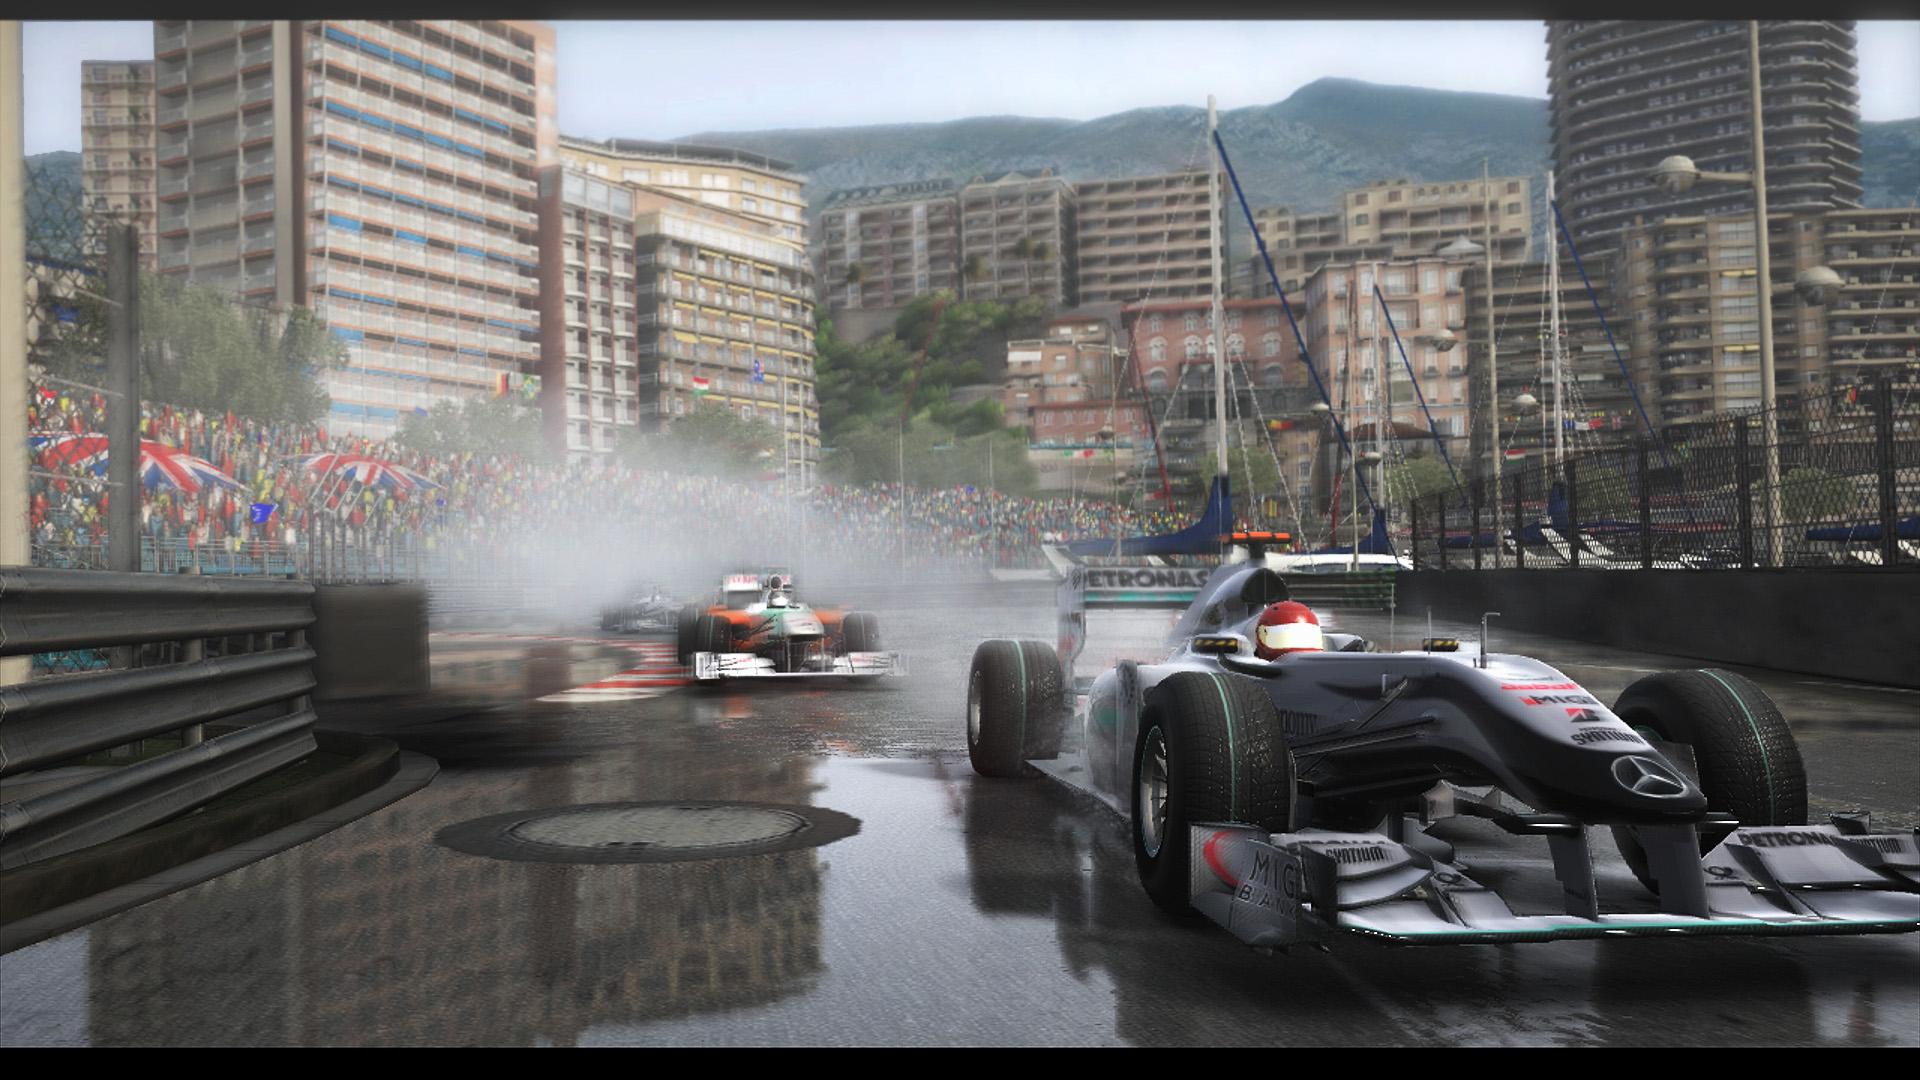 Codemasters reagují na kritiku AI v F1 2010 13133